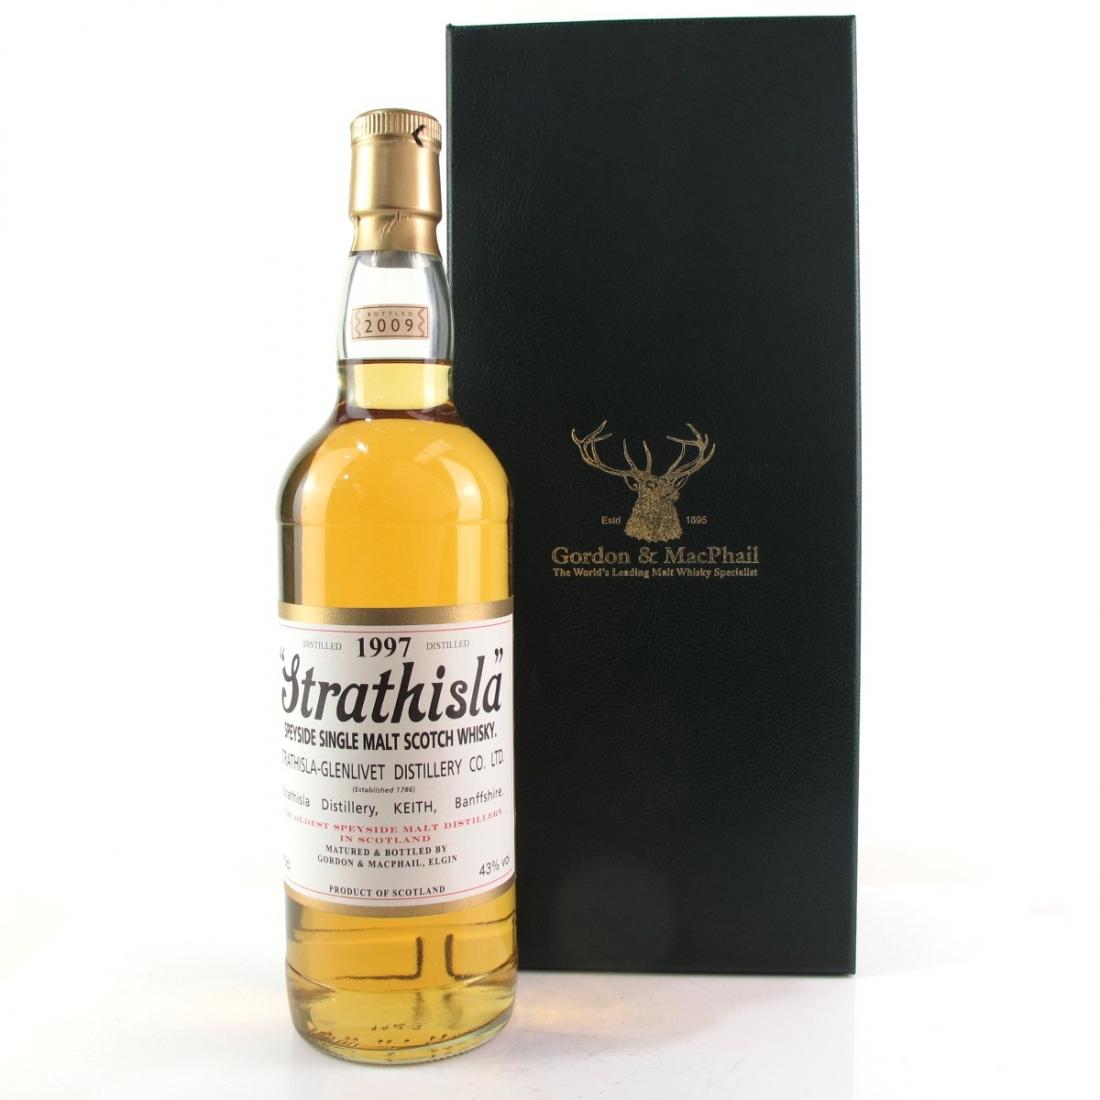 Strathisla 1997 Gordon and MacPhail